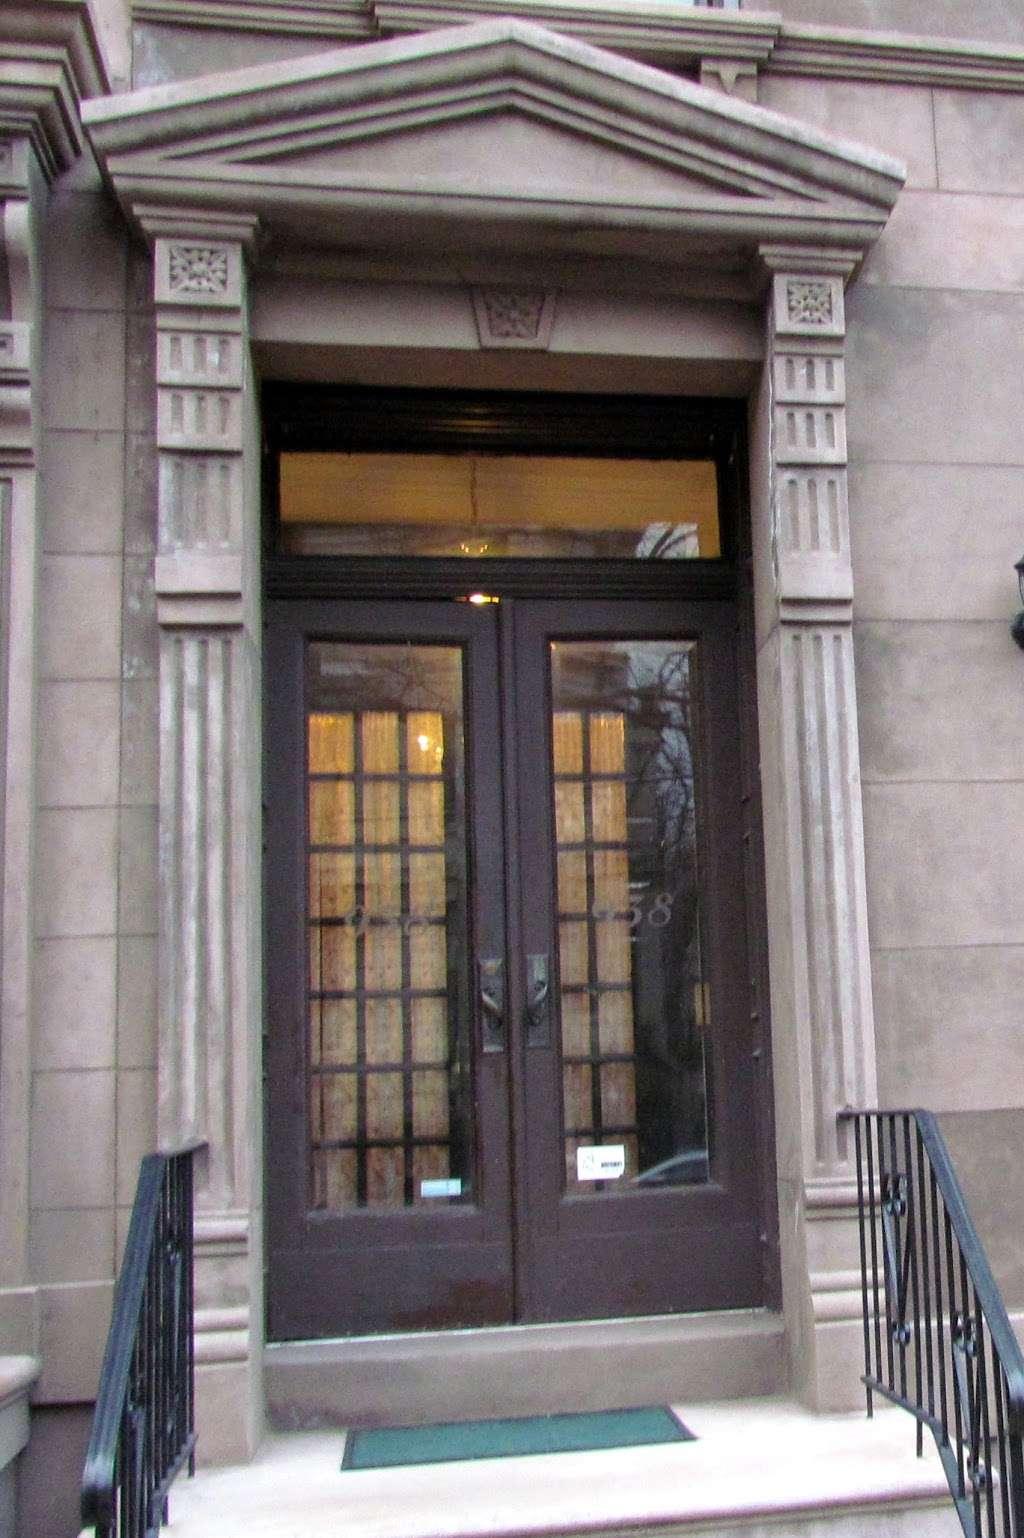 Marc L. Melnick DDS - dentist  | Photo 1 of 2 | Address: 460 Engle St, Englewood, NJ 07631, USA | Phone: (201) 615-7501